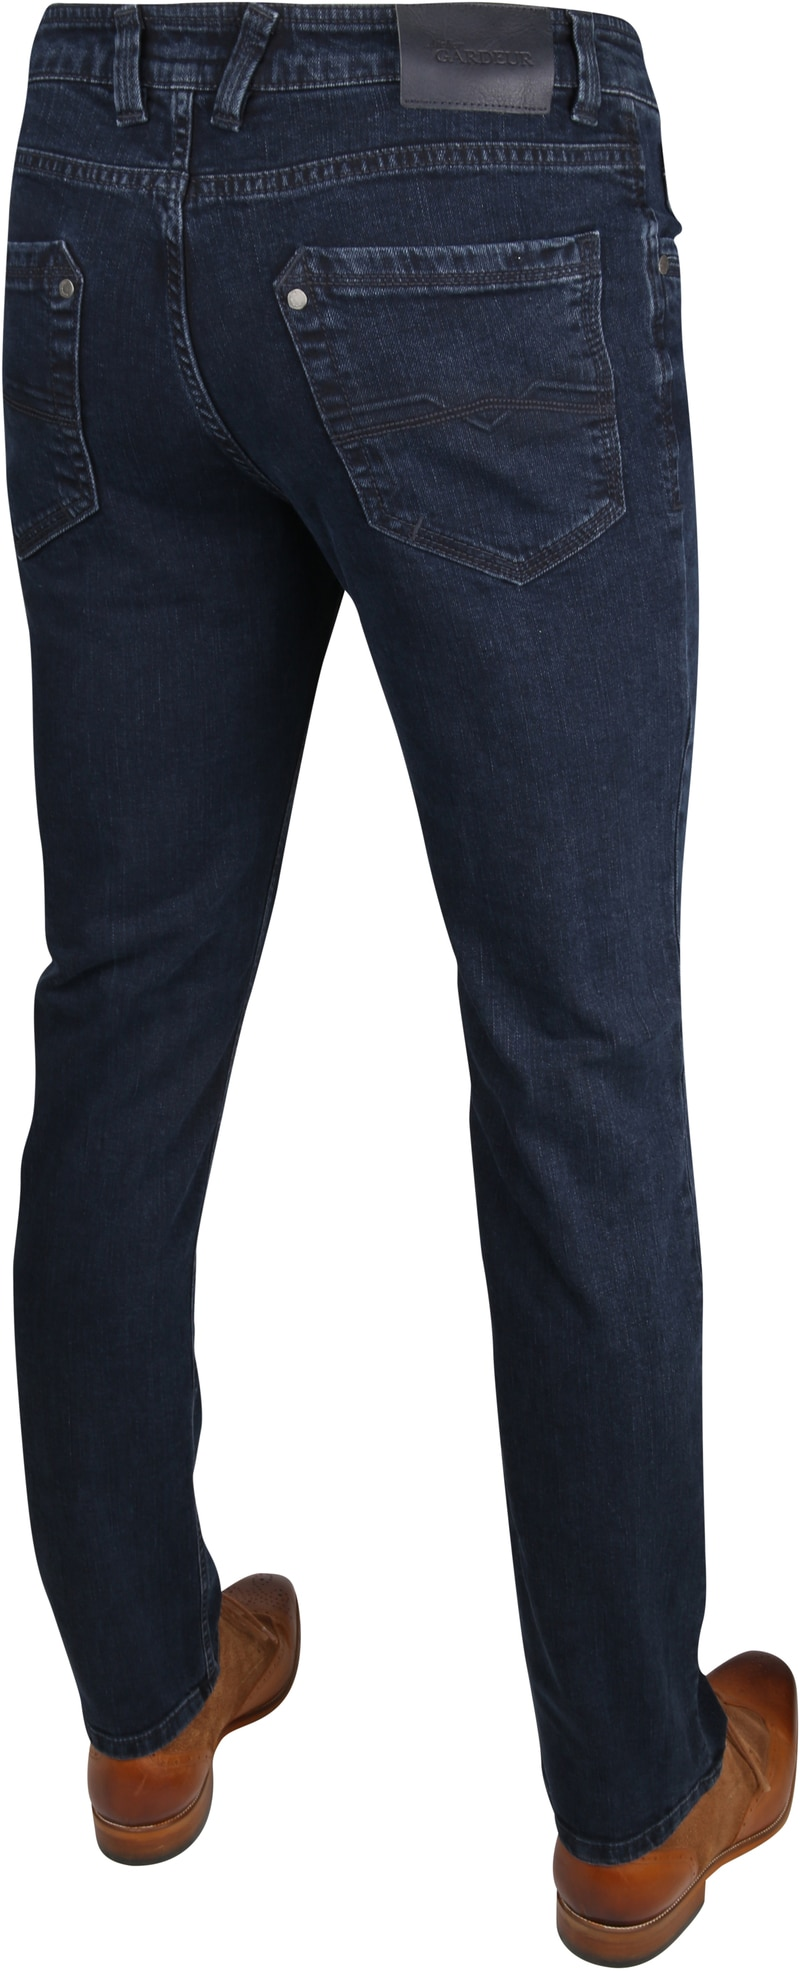 Gardeur Batu Jeans Navy foto 3